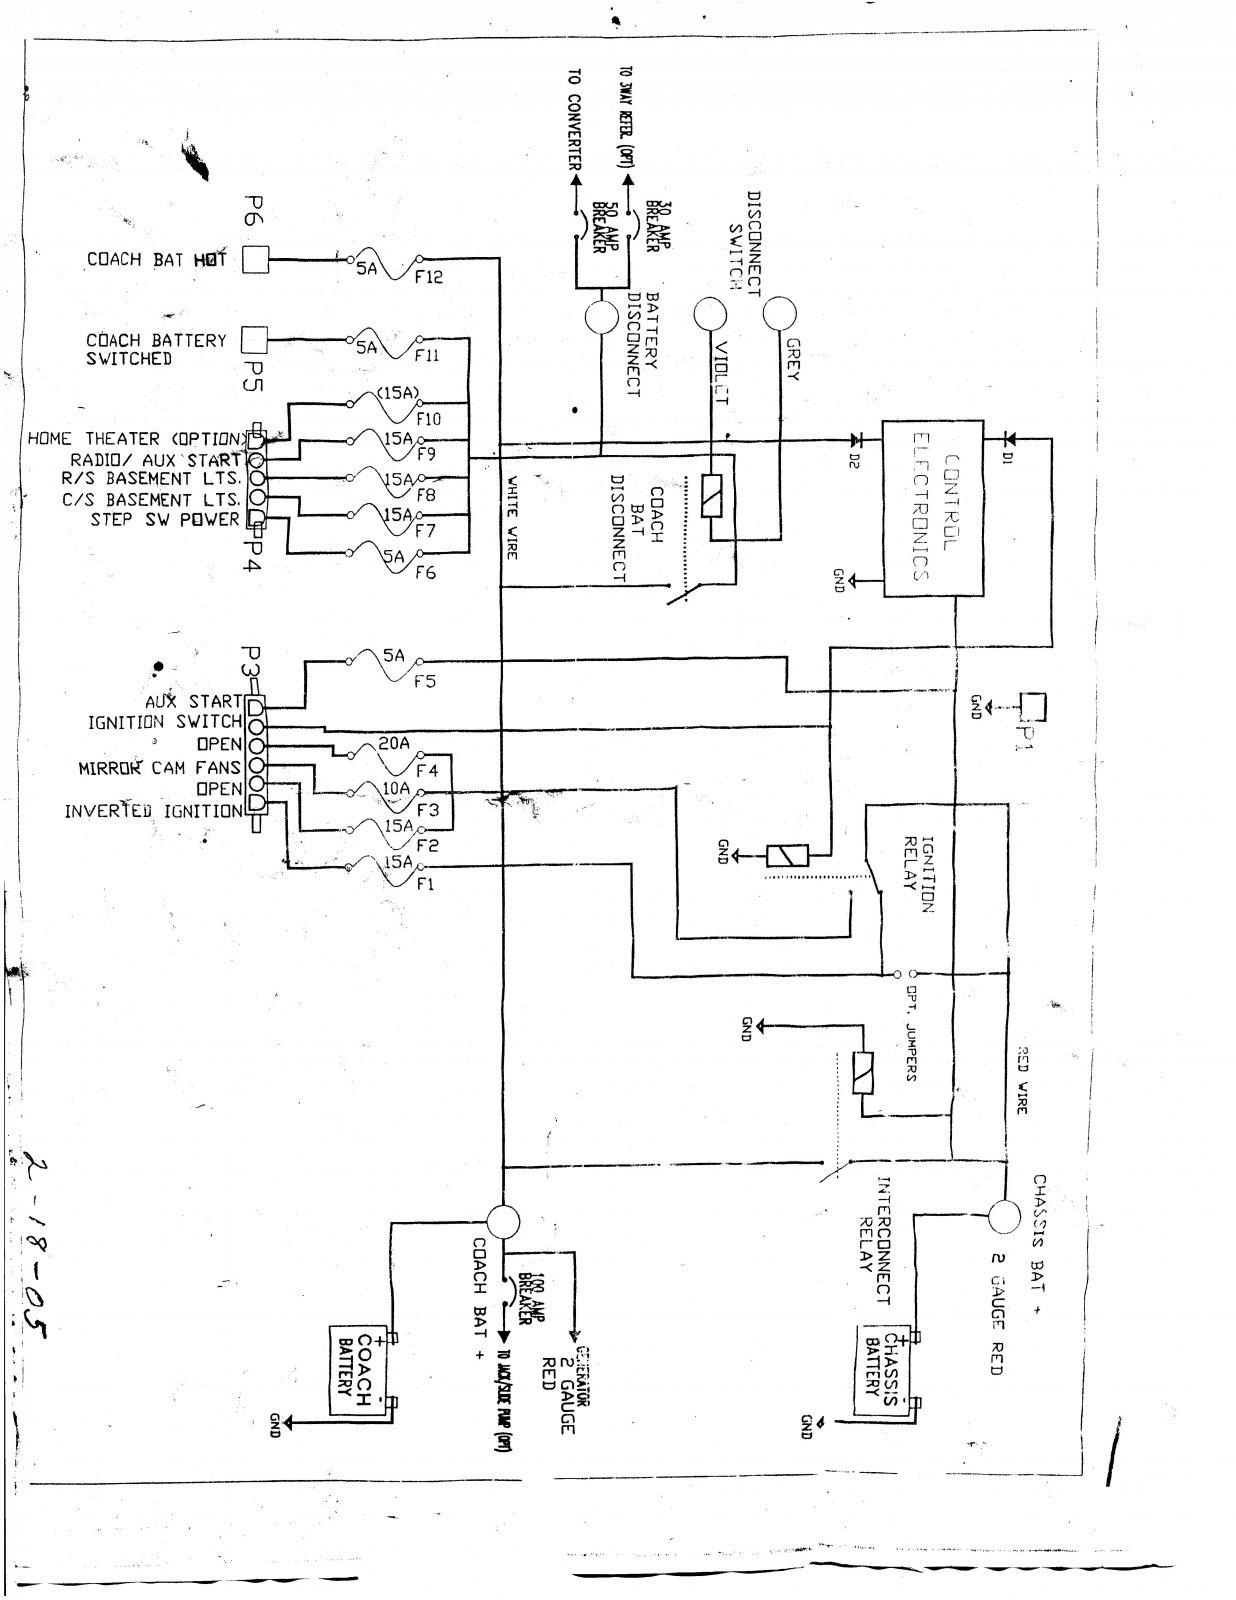 2001 sterling 9500 wiring diagram